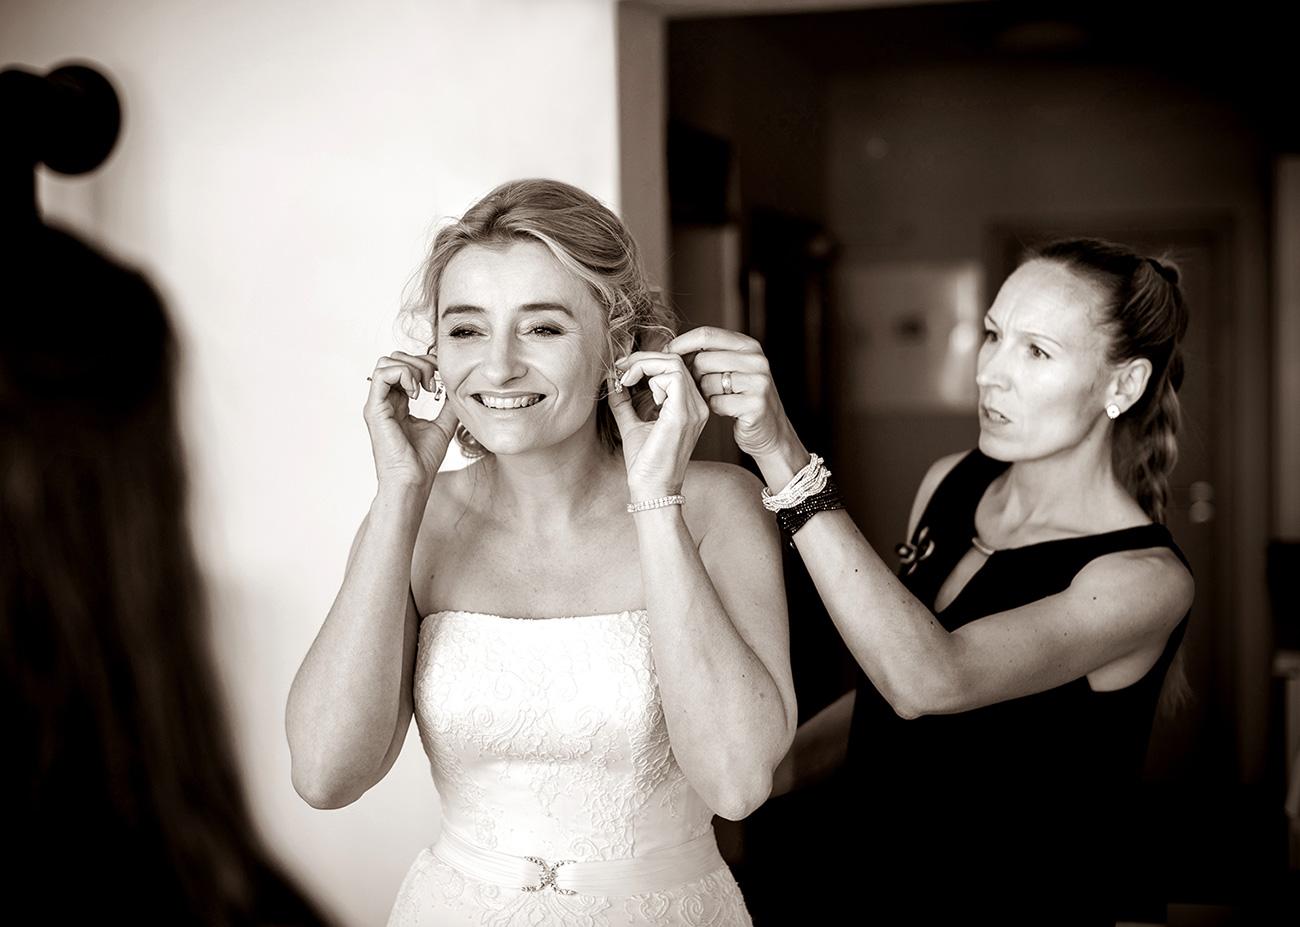 02 svatebni foto nevesta s zenichem lipno dolni vltavice svatebni fotograf ales motejl jihocesky kraj